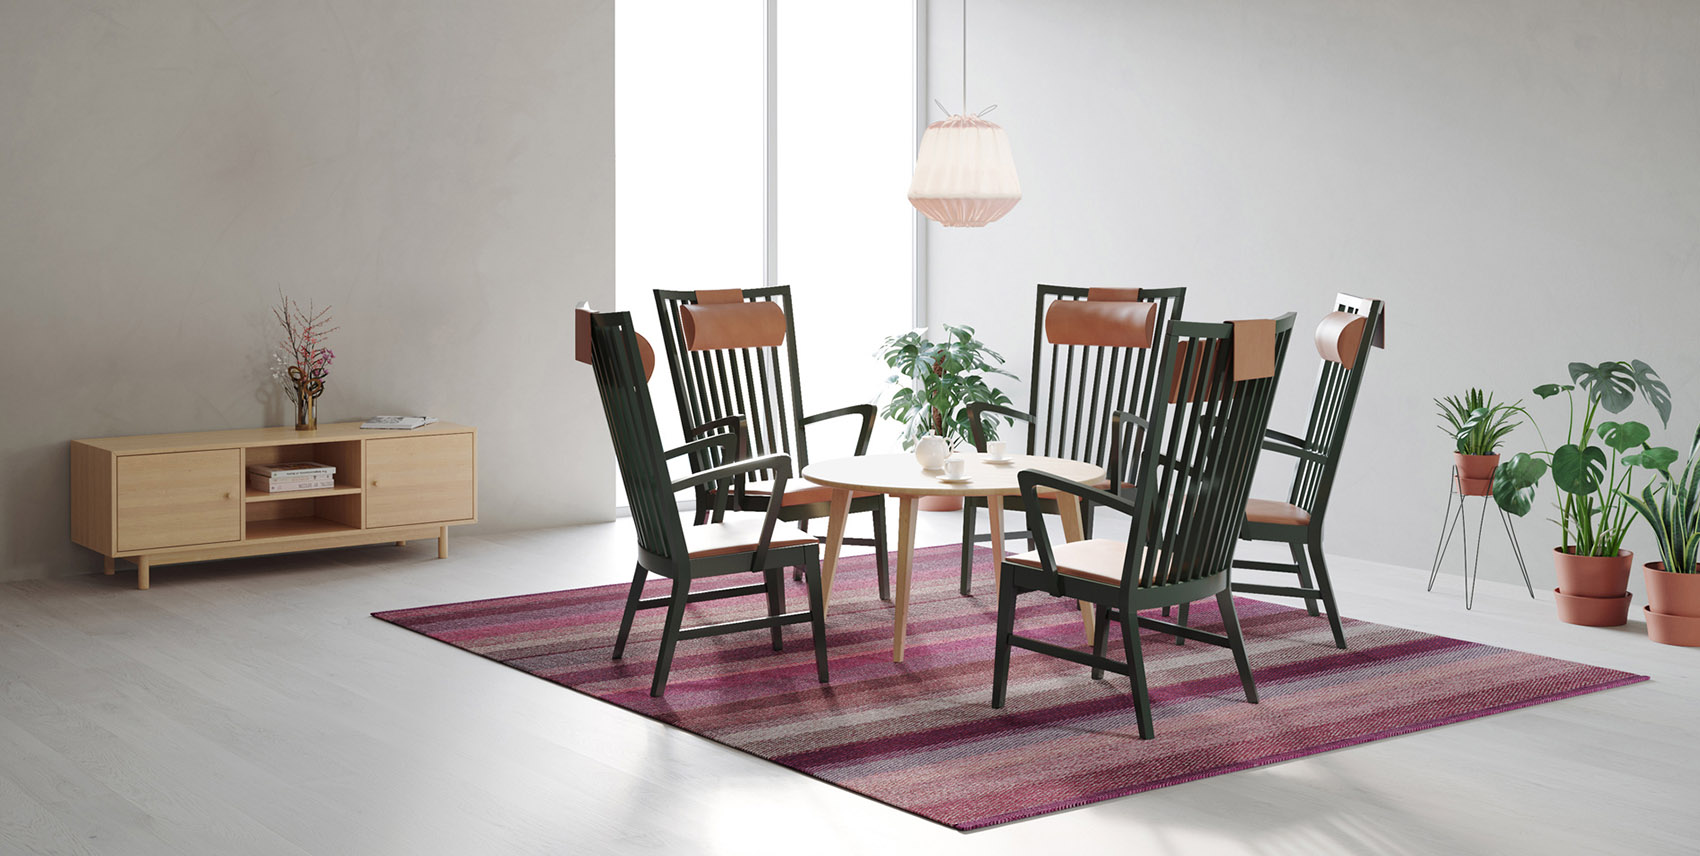 Ekdahls möbler